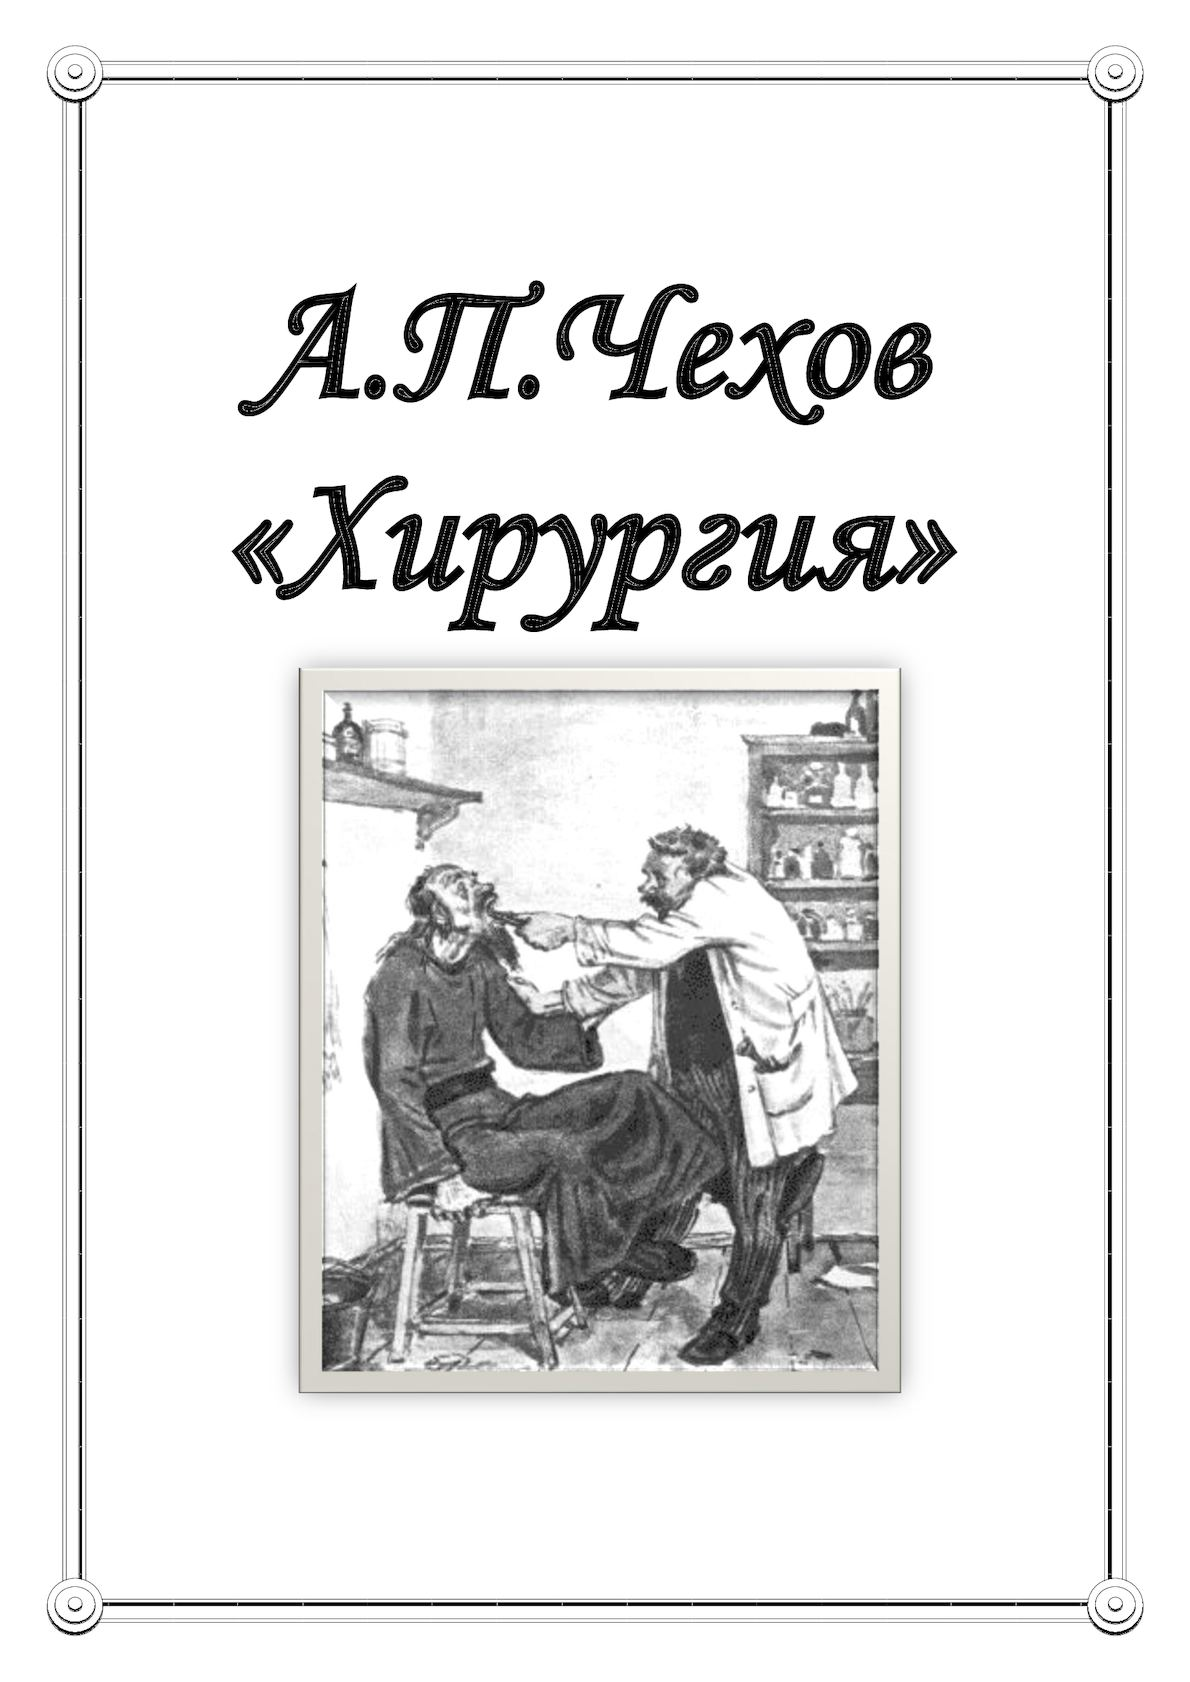 Хирургия картинки чехов, открытки для